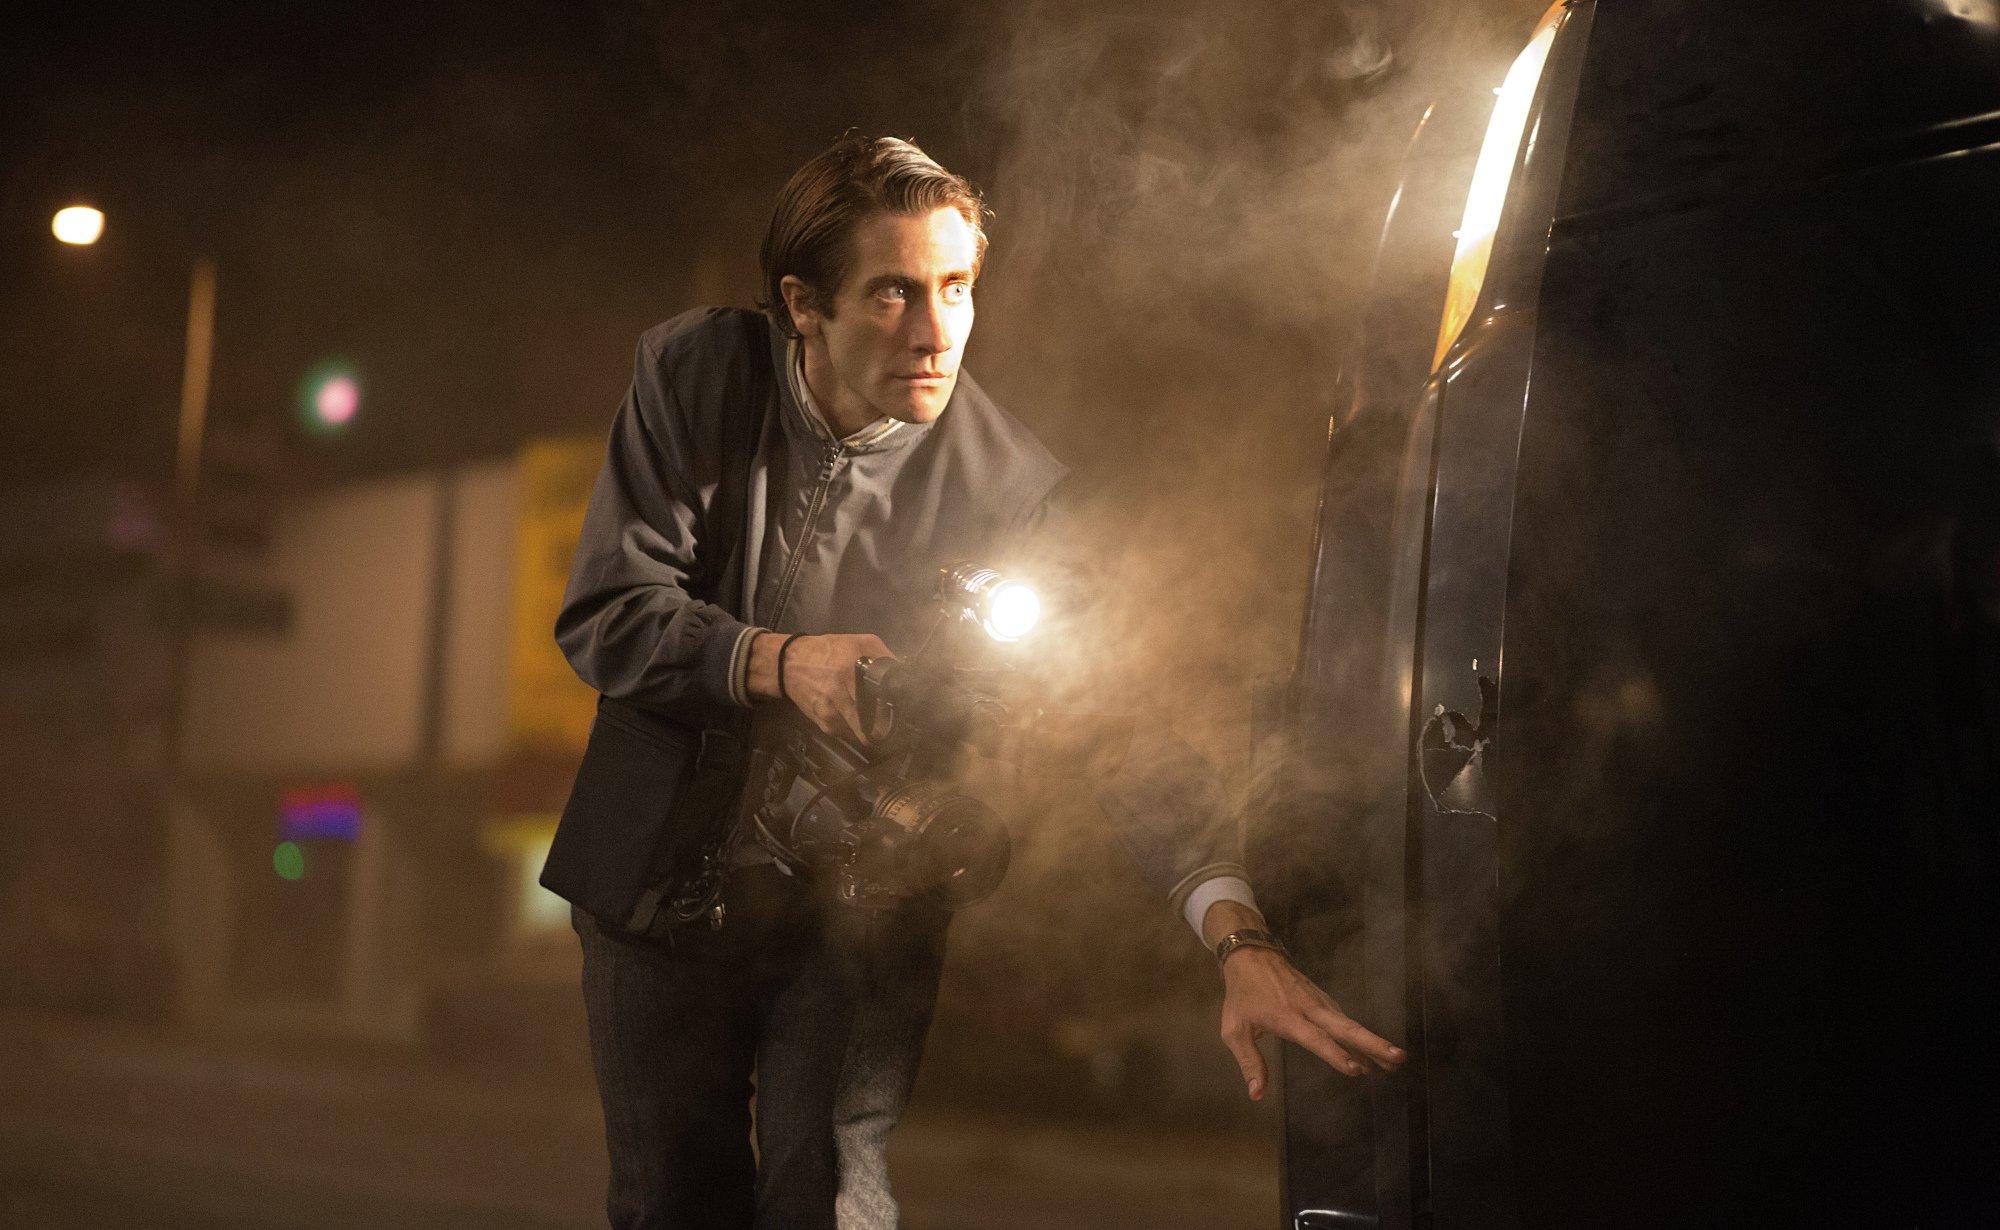 Best Jake Gyllenhaal Movies - Nightcrawler